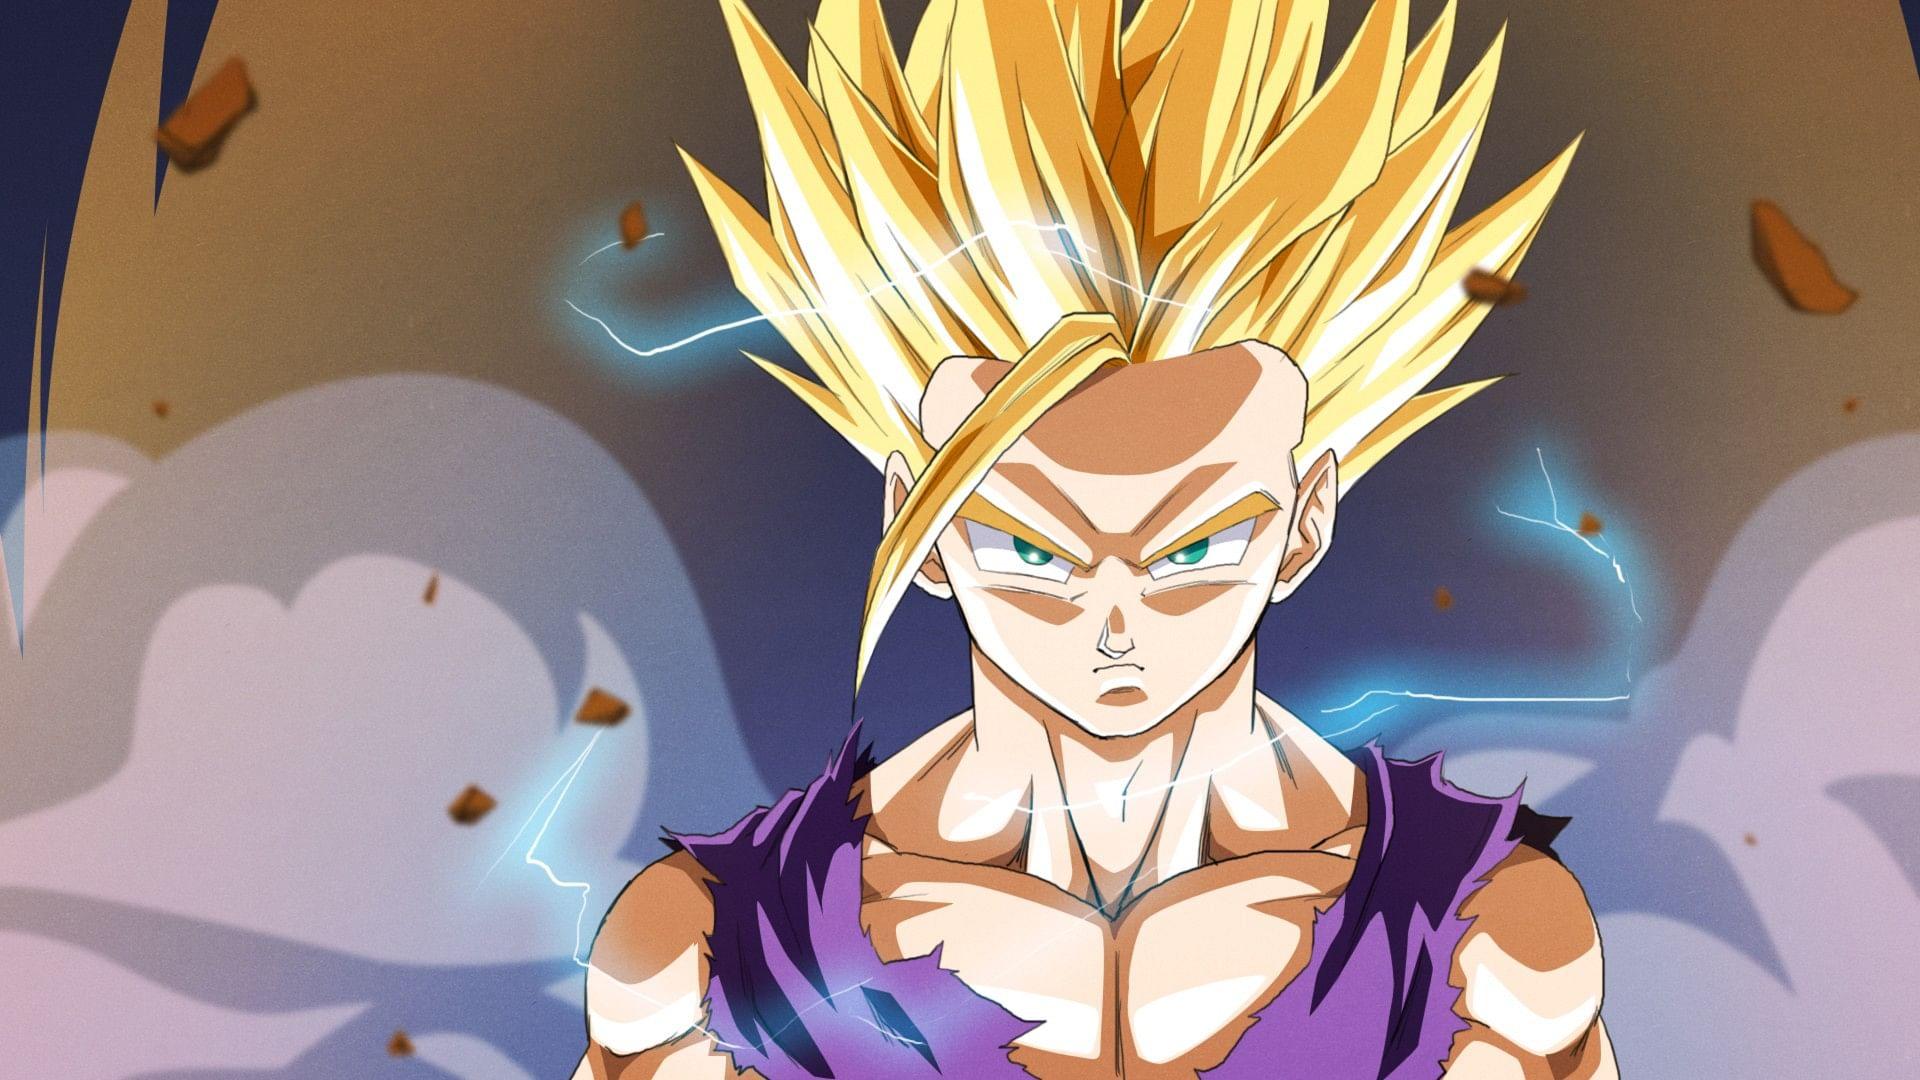 Top 10 Dragon Ball Z games - Slide 1 of 10